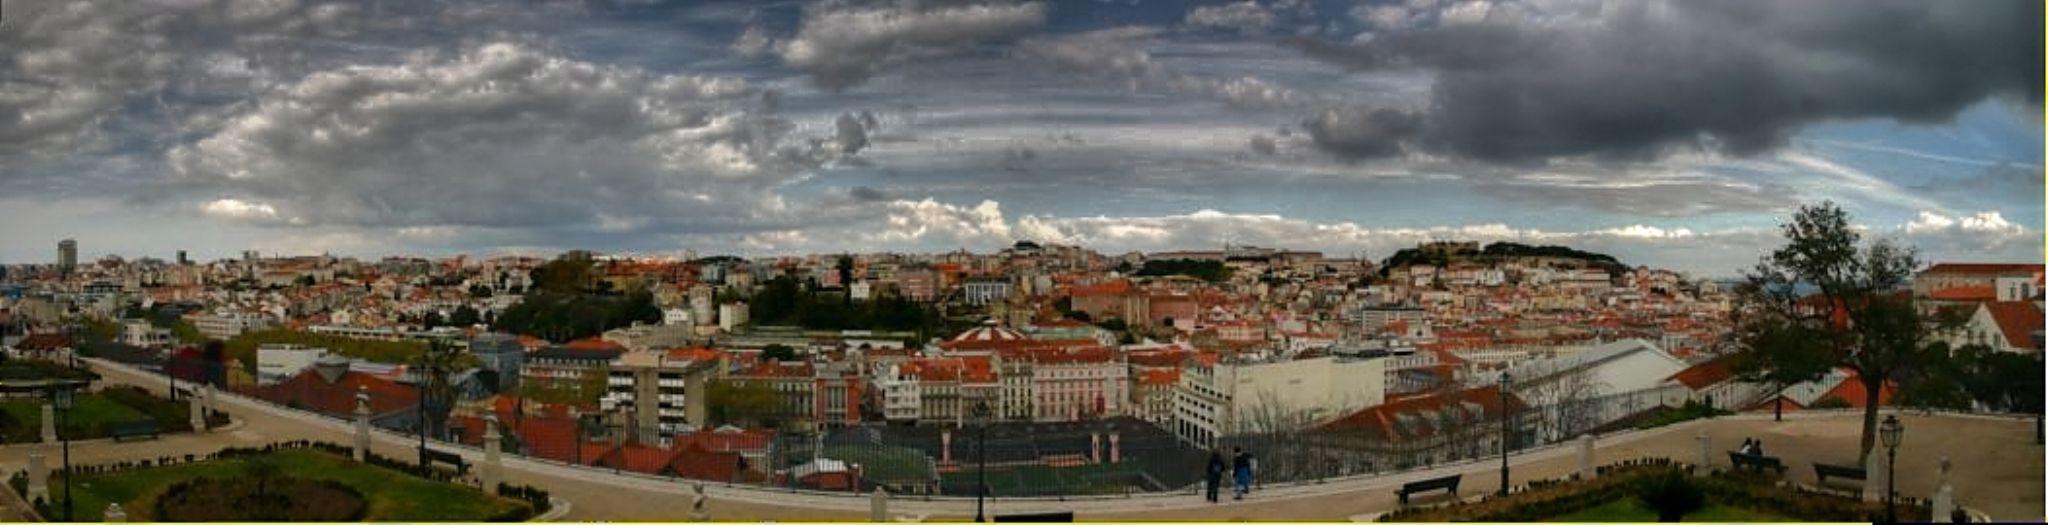 Lisbon  by Ricardo Santos